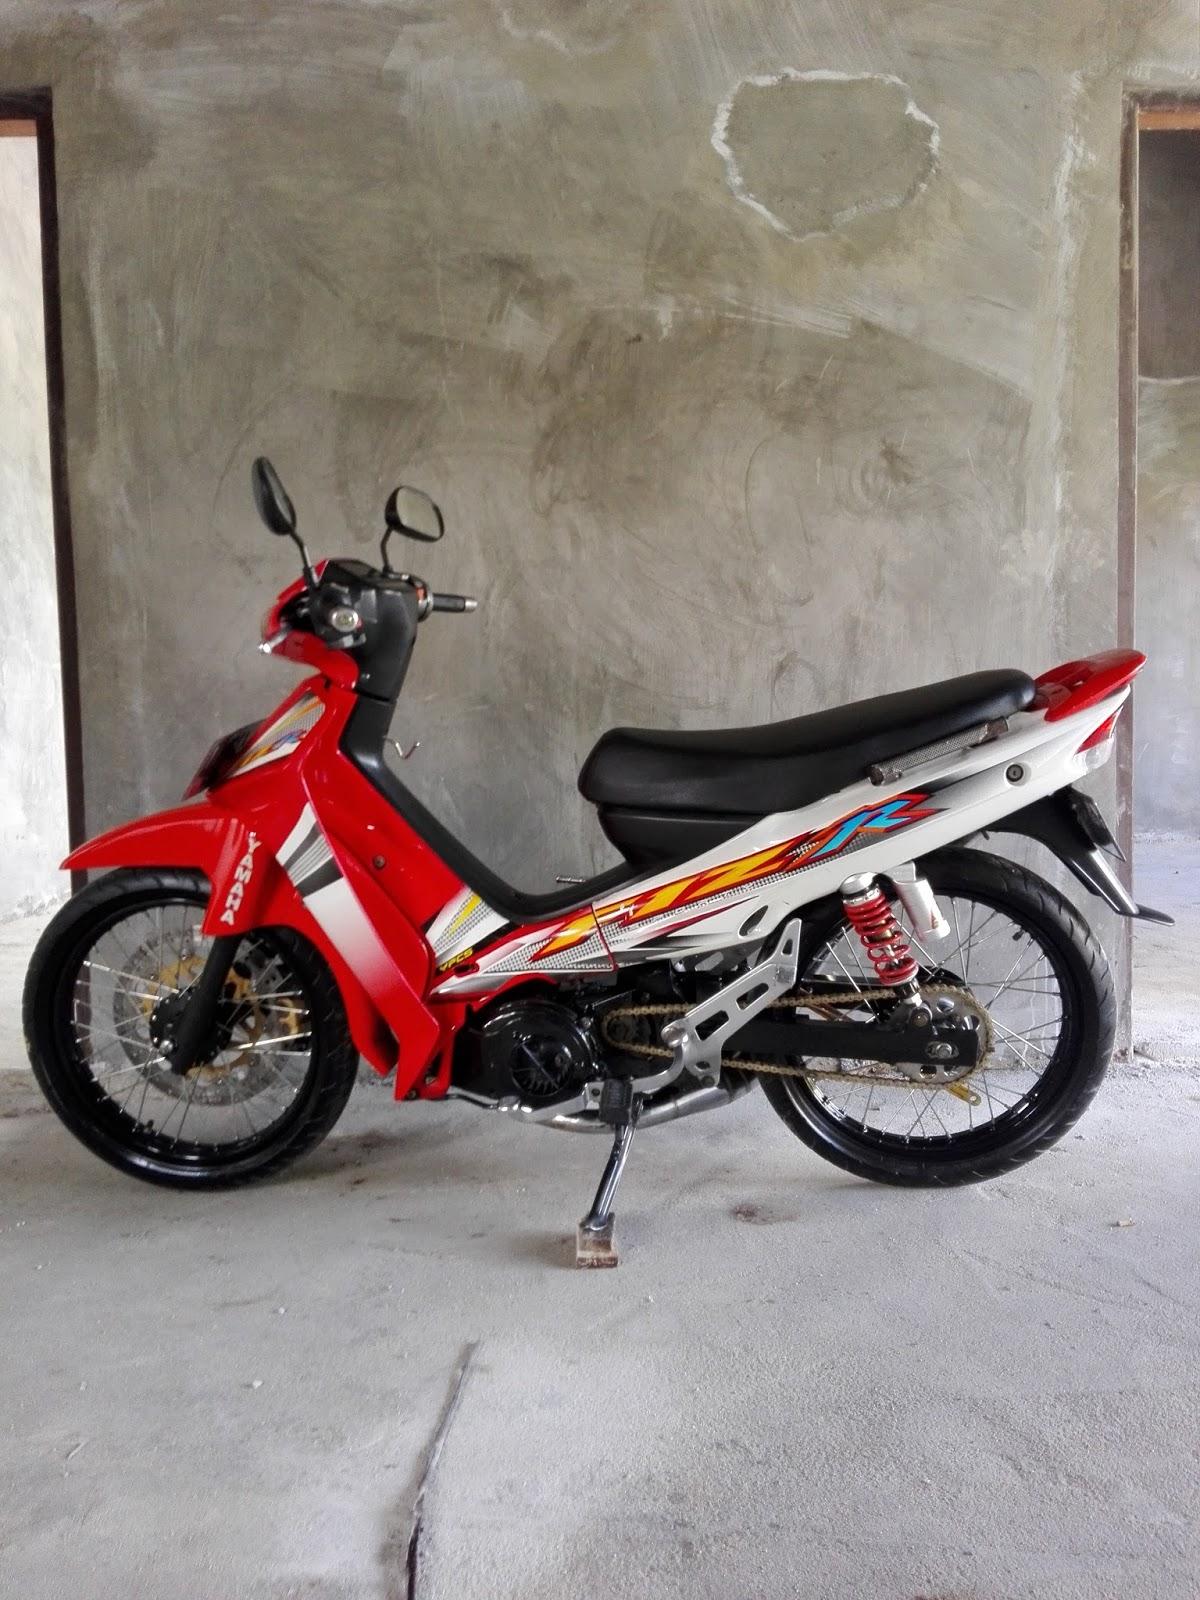 F1zr Modif : modif, Koleksi, Modifikasi, Warna, Yamaha, Terbaik, Kempoul, Motor